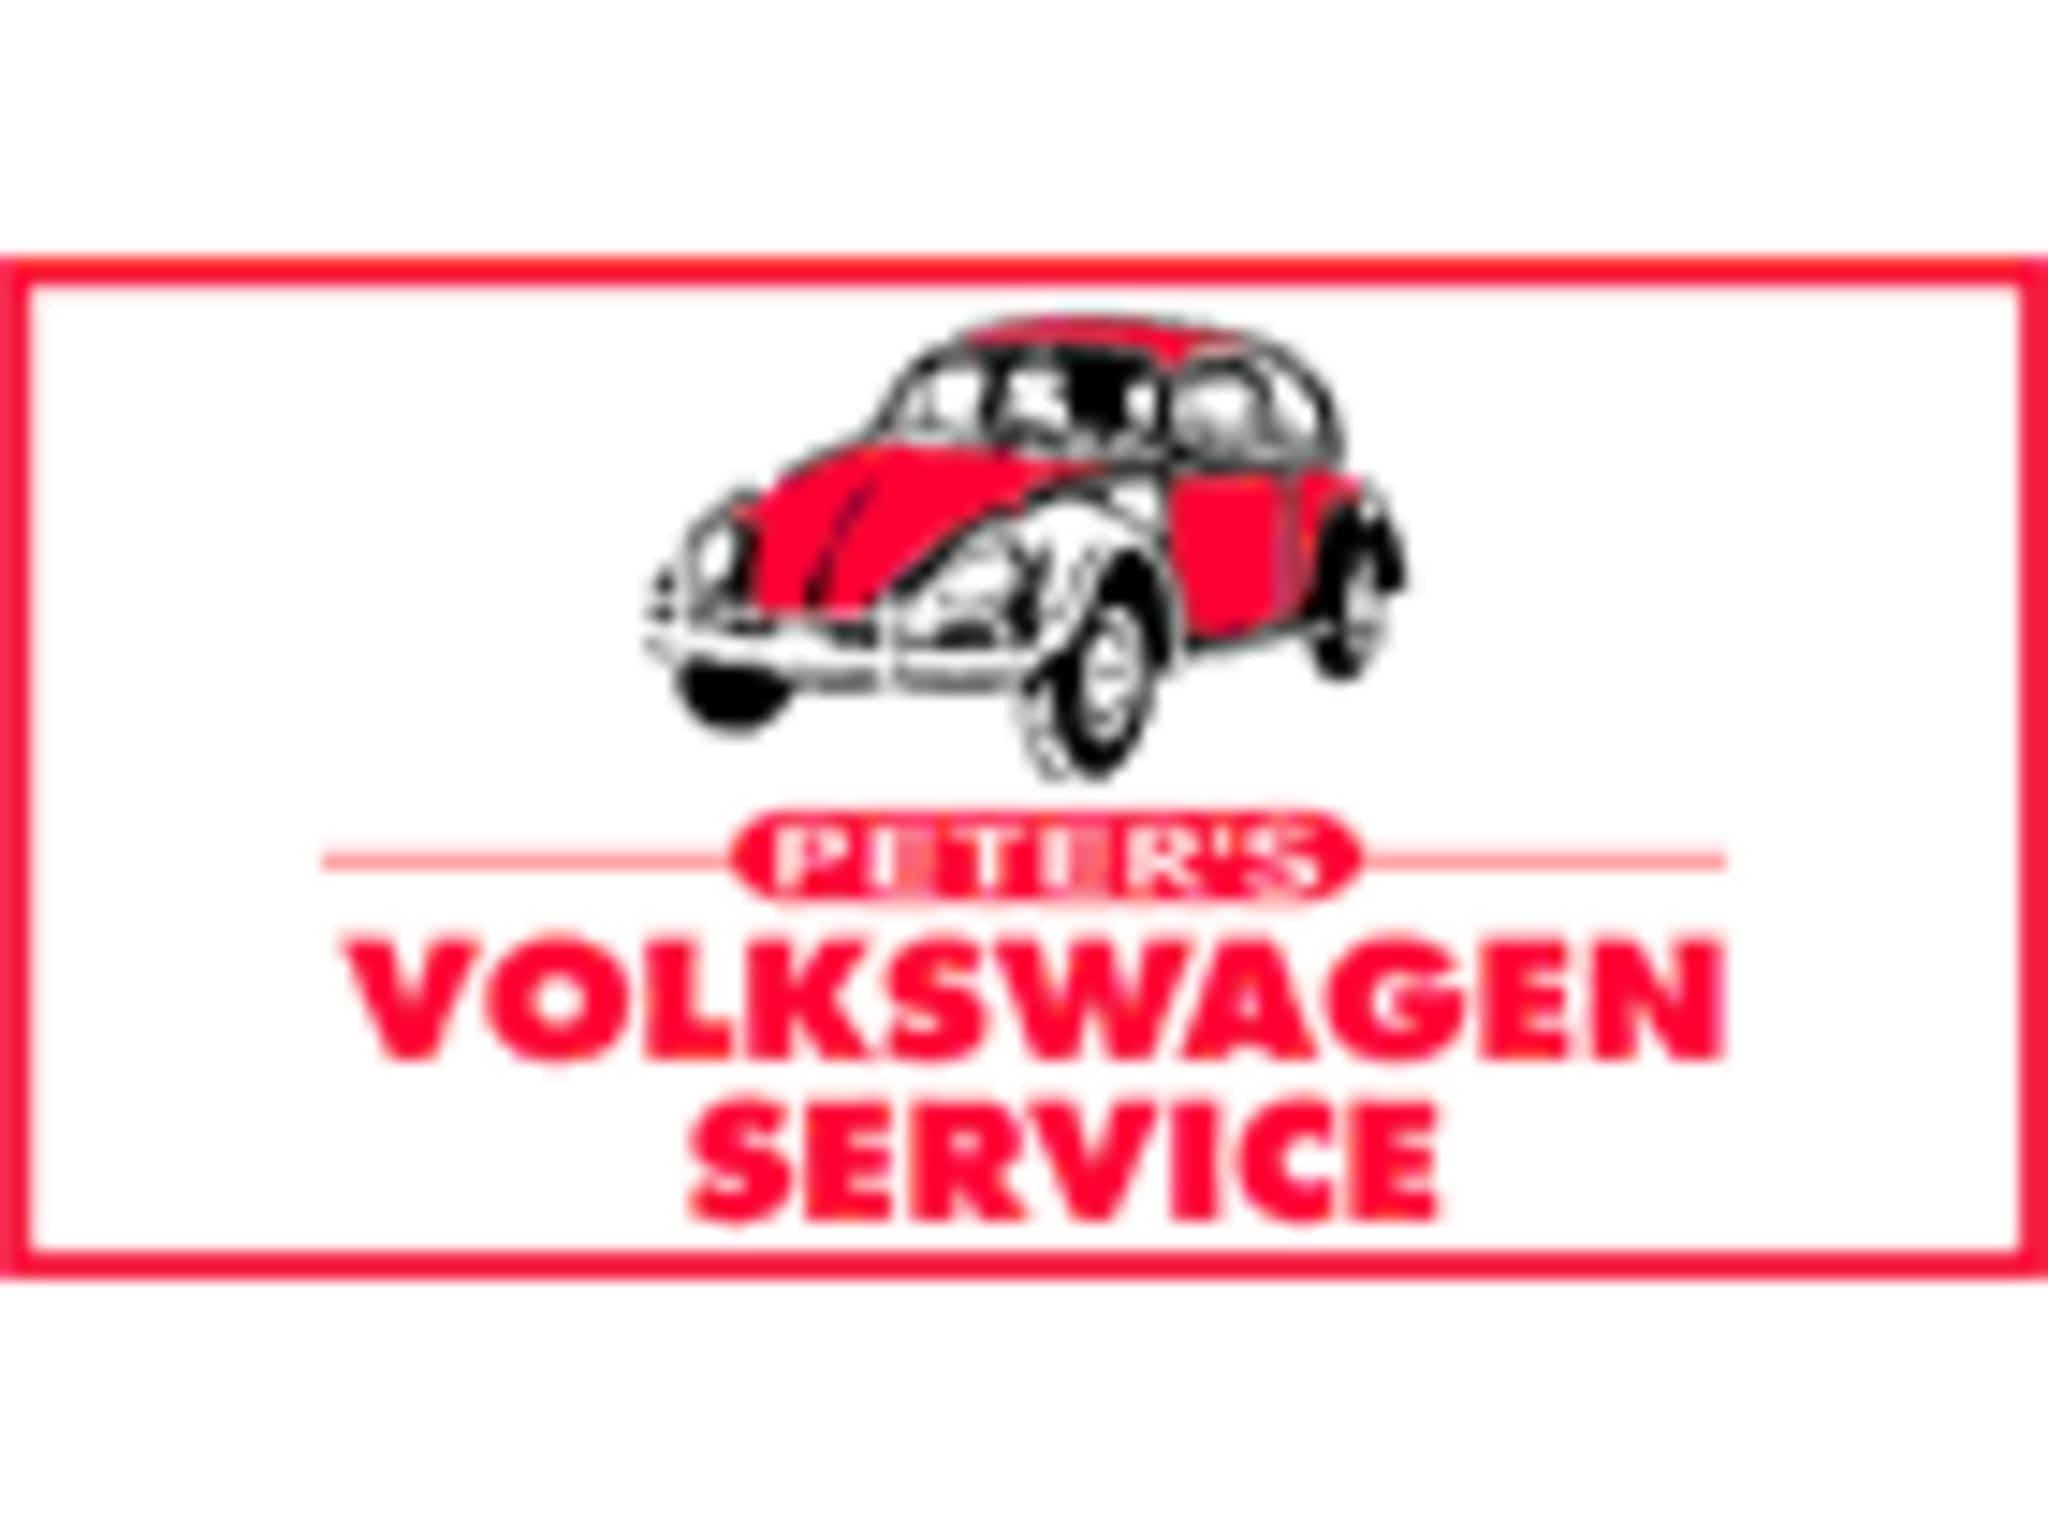 photo Peter's VW Service